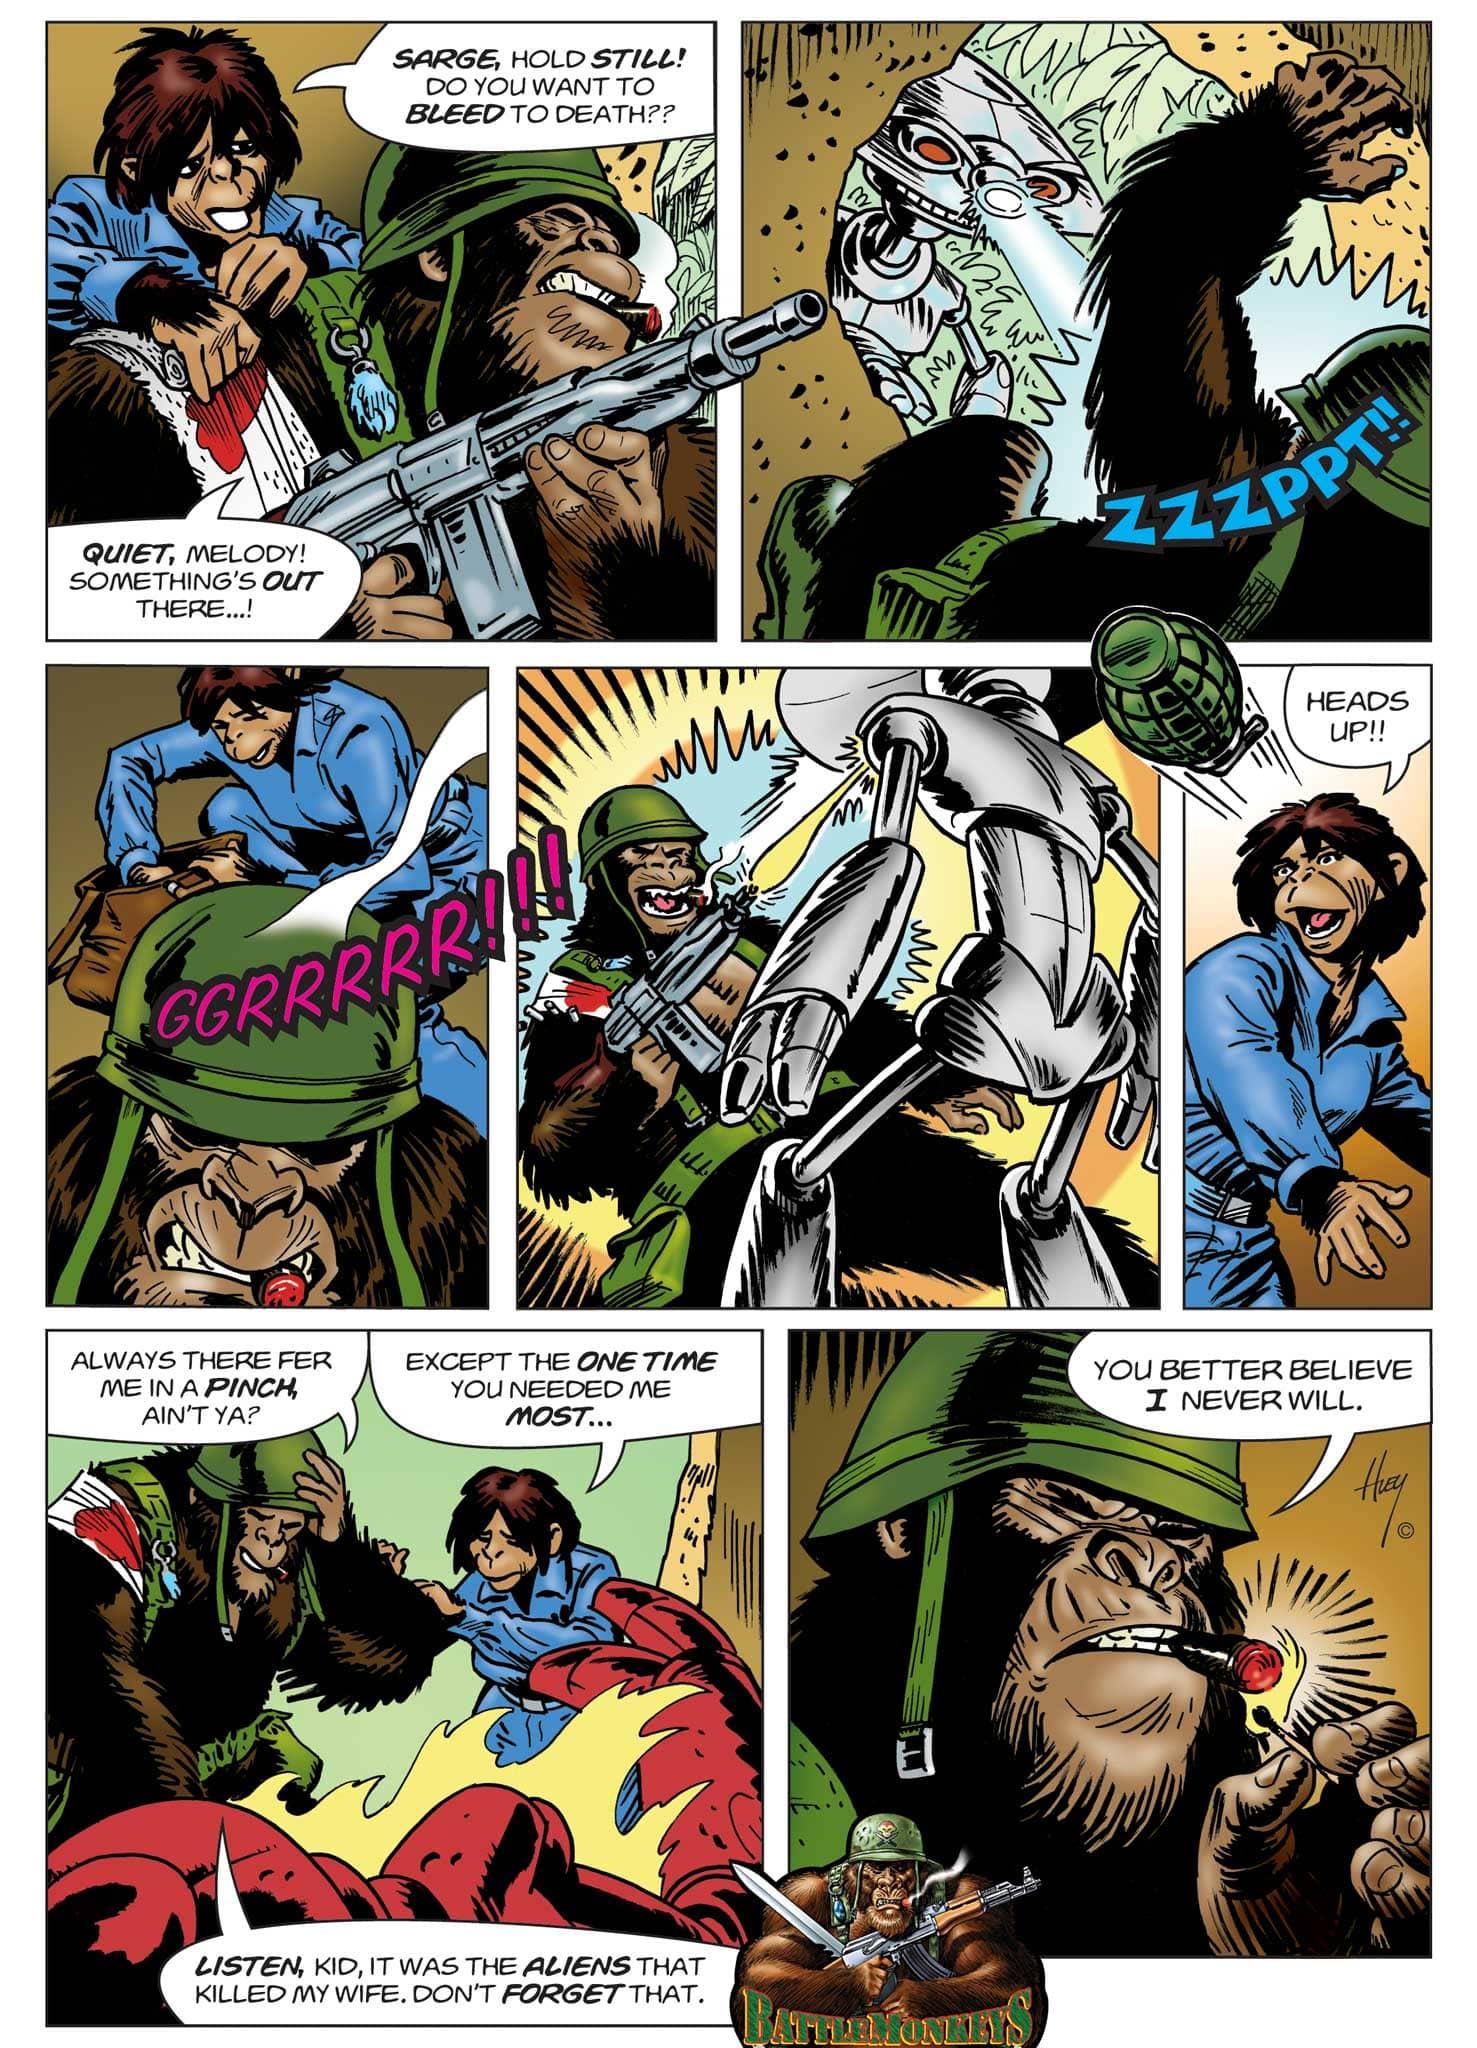 KH2900B-battle-monkeys-comic